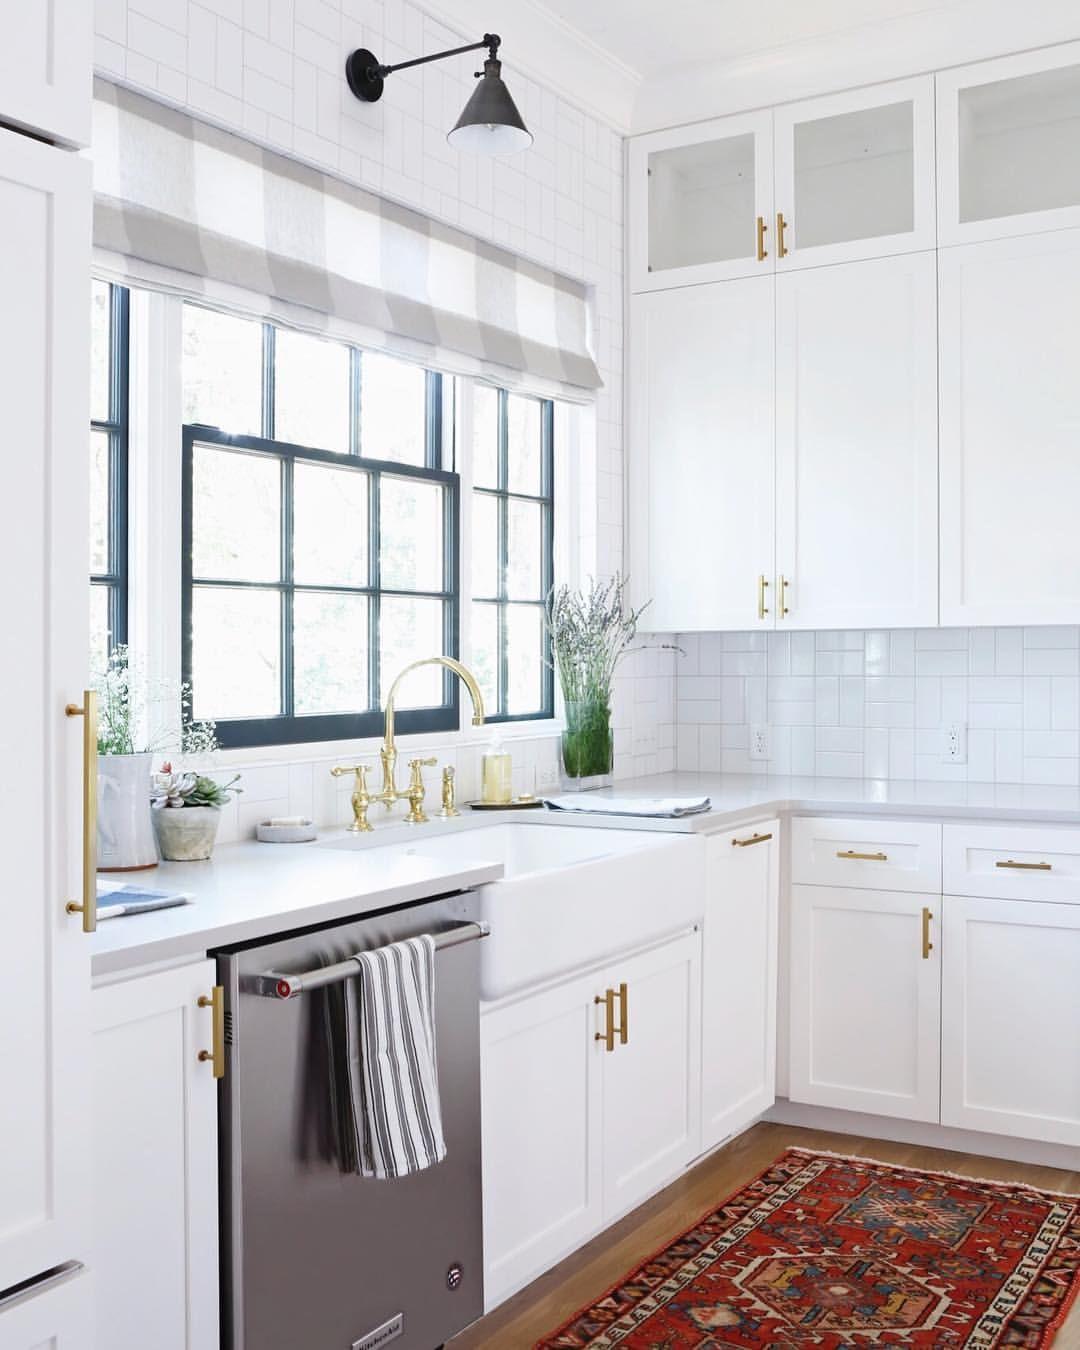 10x10 Kitchen Remodel: TGIF, TGI☀️ . . . Photograph